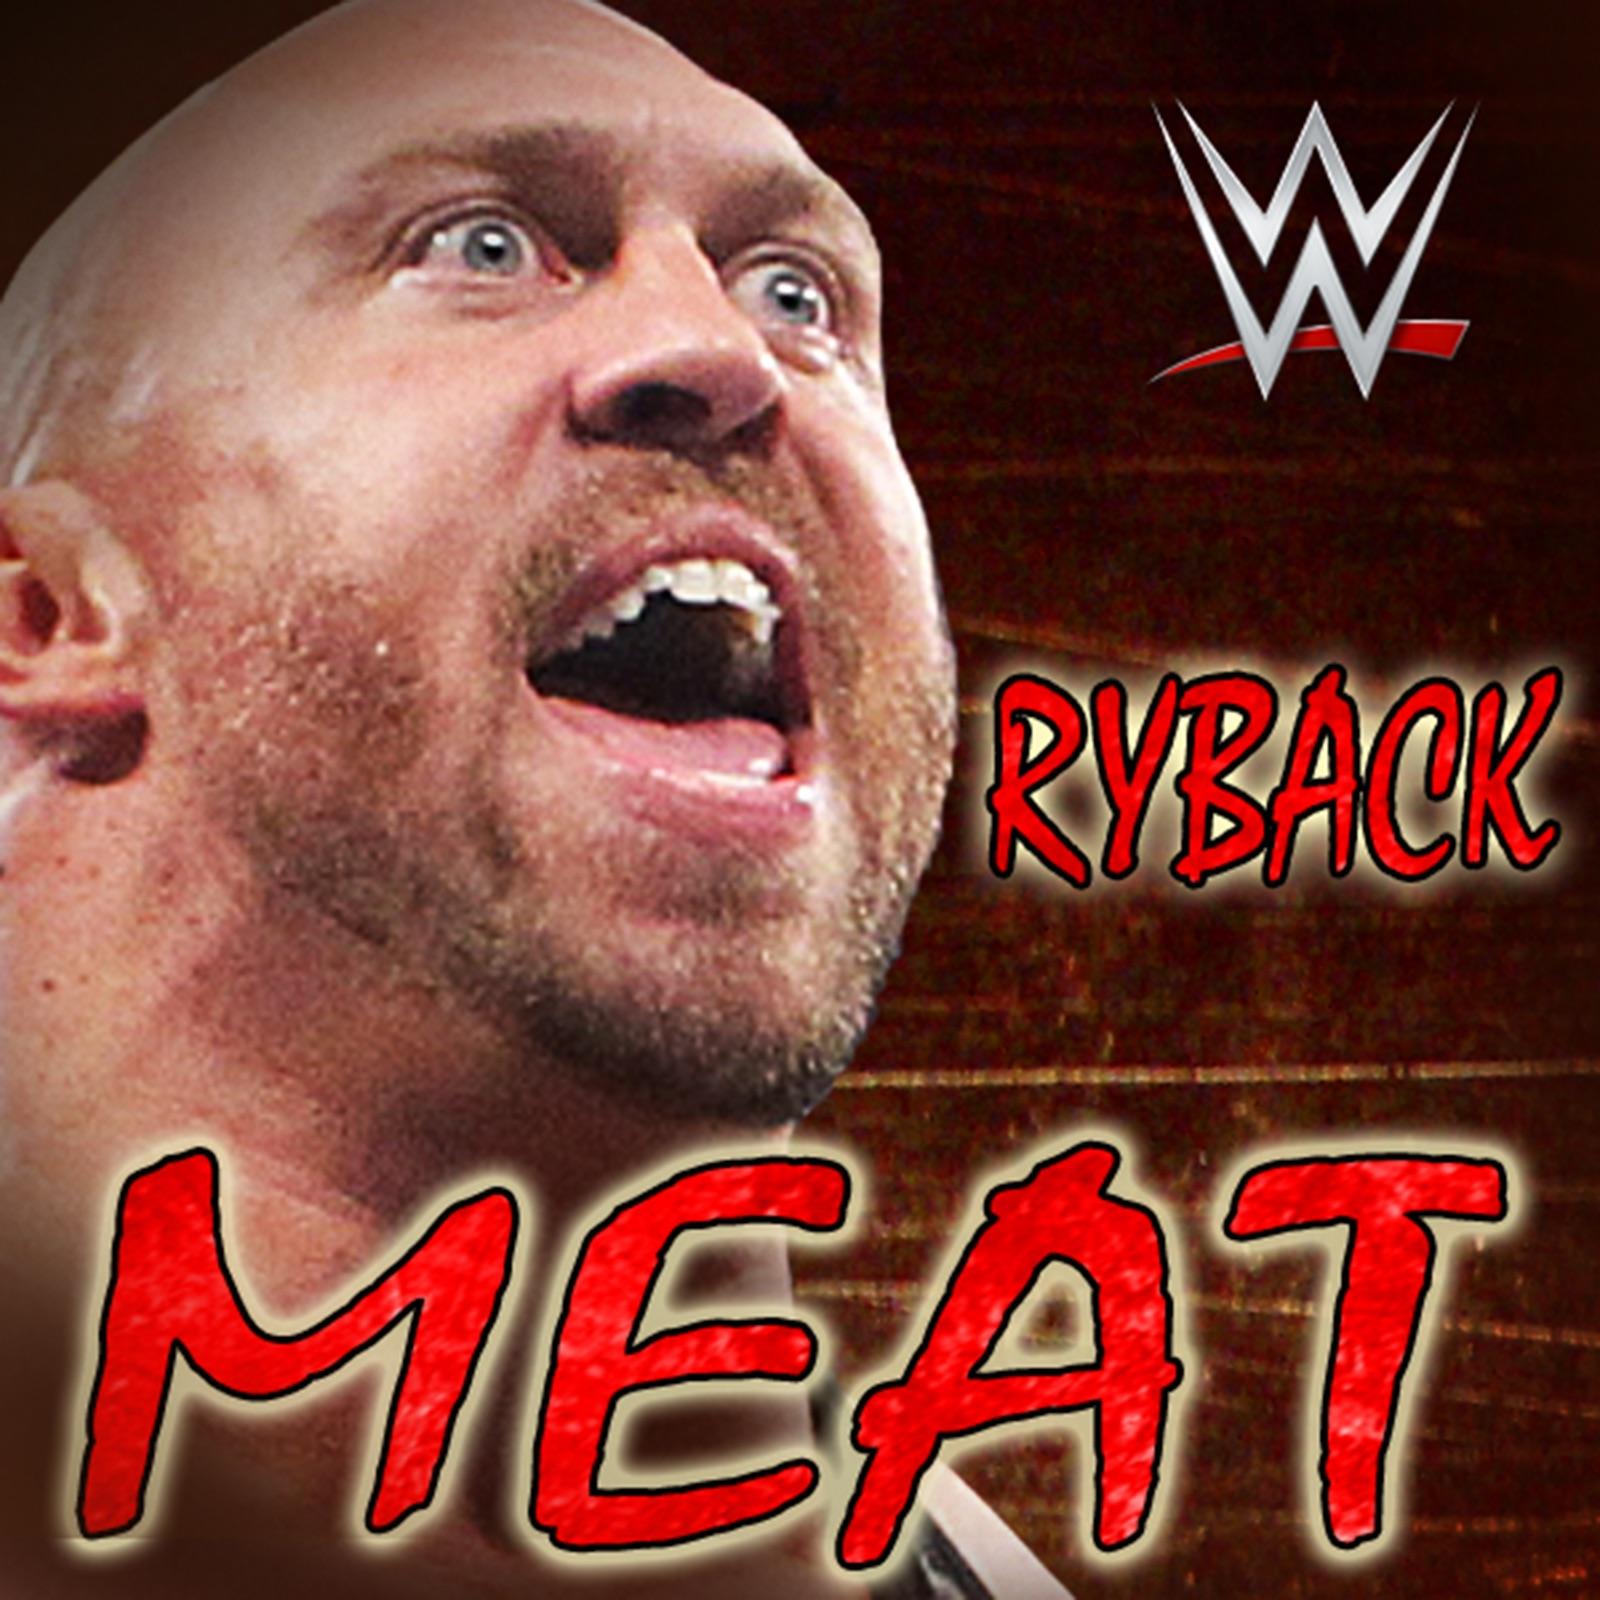 WWE: Meat (Ryback) - Single